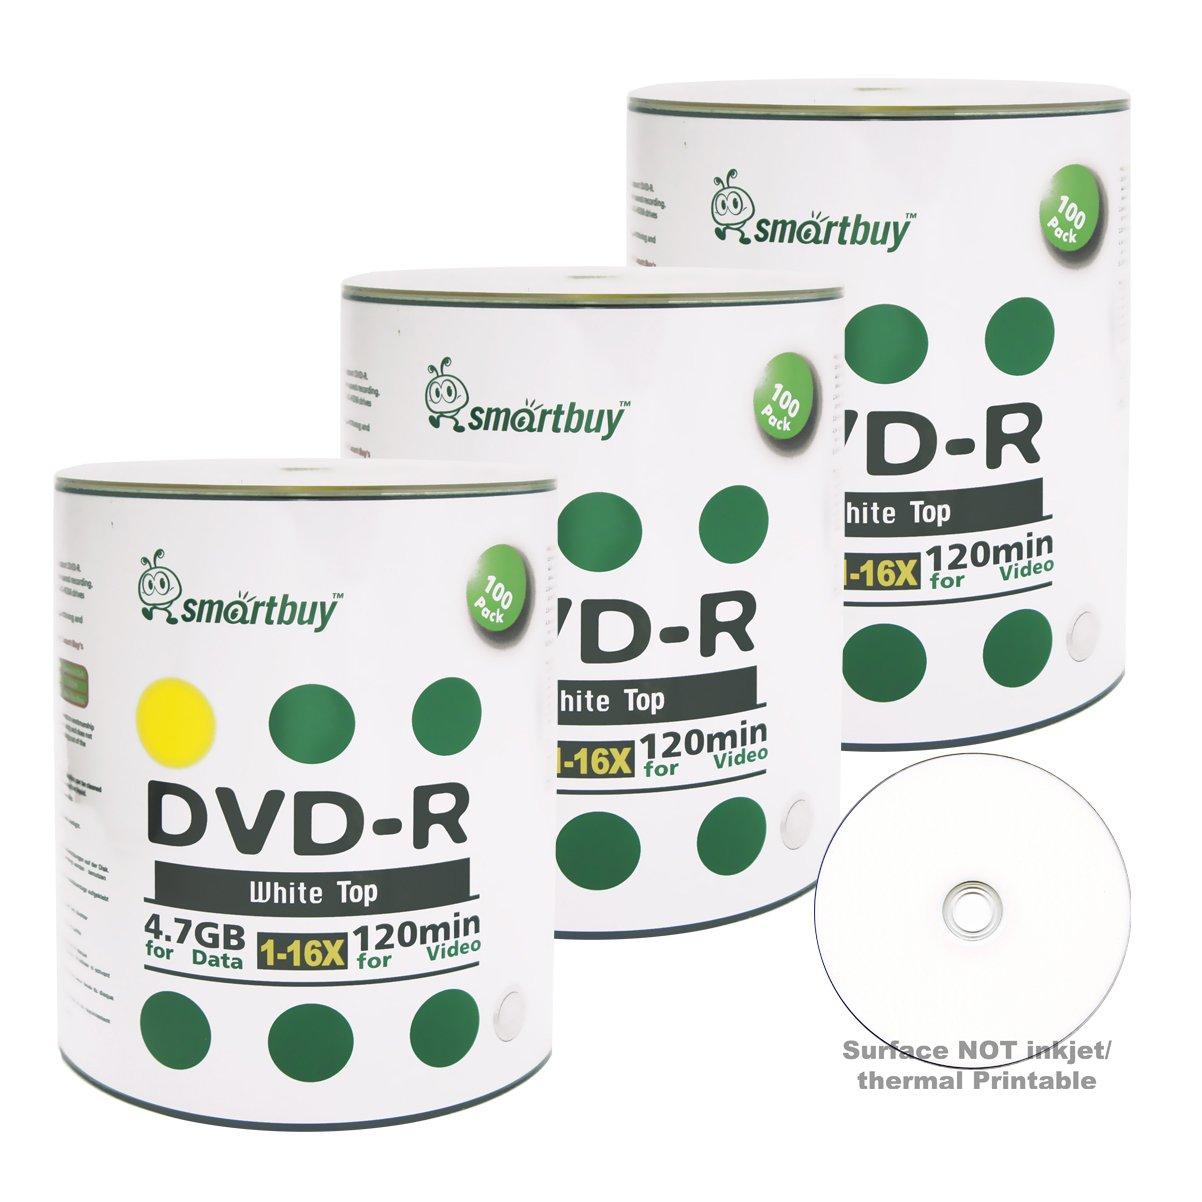 Smartbuy 300-disc 4.7gb/120min 16x DVD-R White Top Blank Data Recordable Media Disc